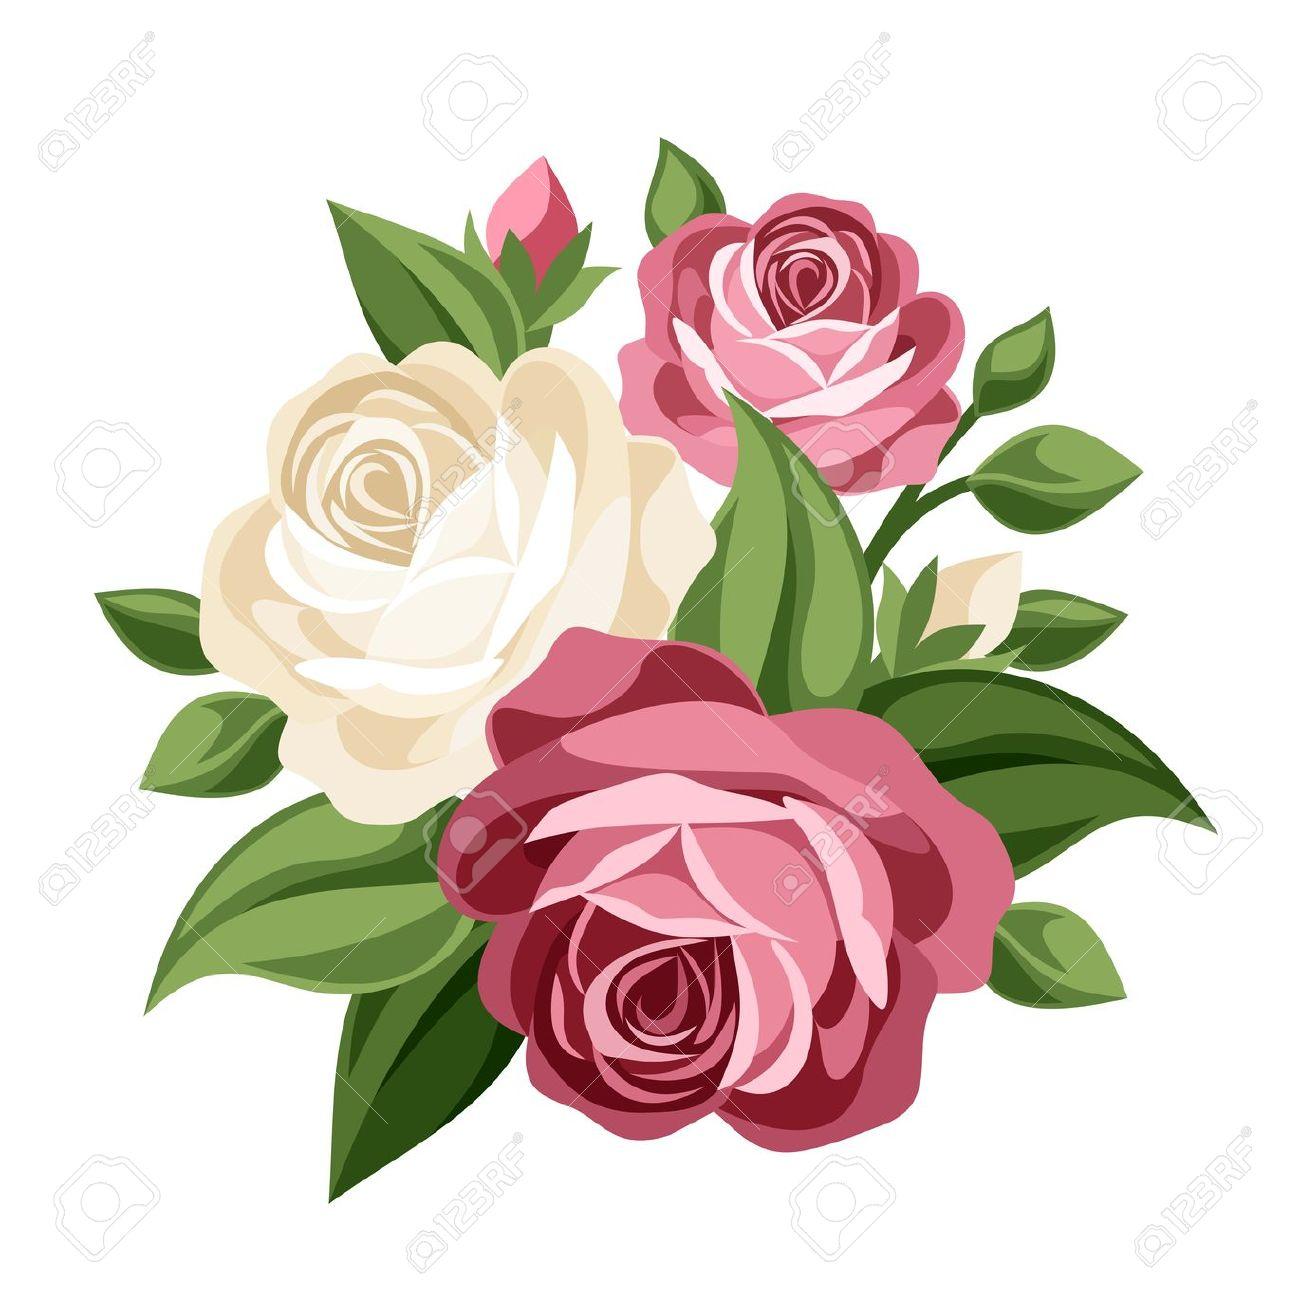 Rose clipart antique flower #13